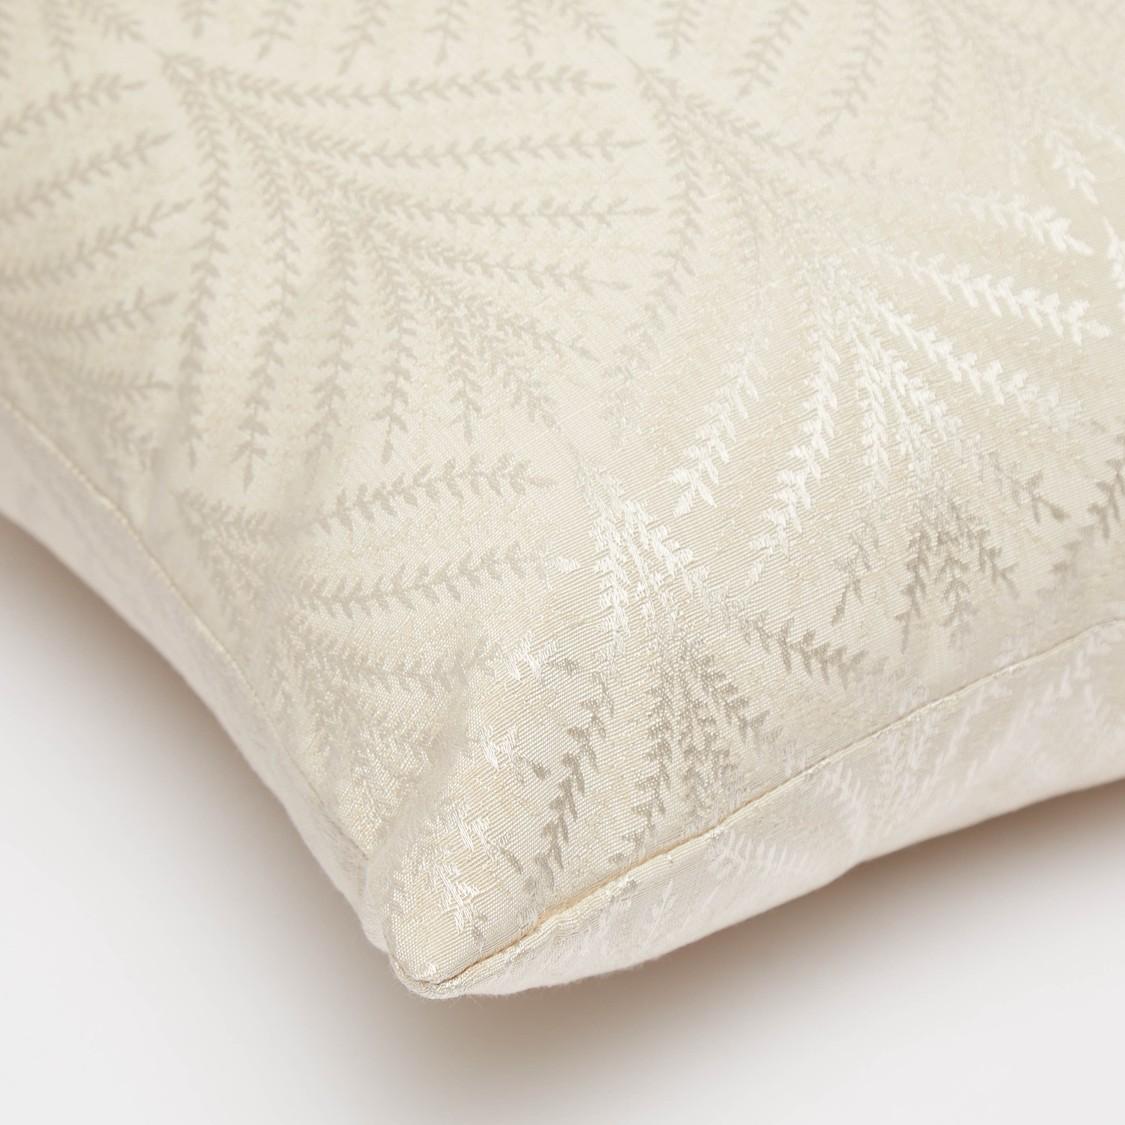 Leaf Print Filled Cushion with Zip Closure - 43x43 cms